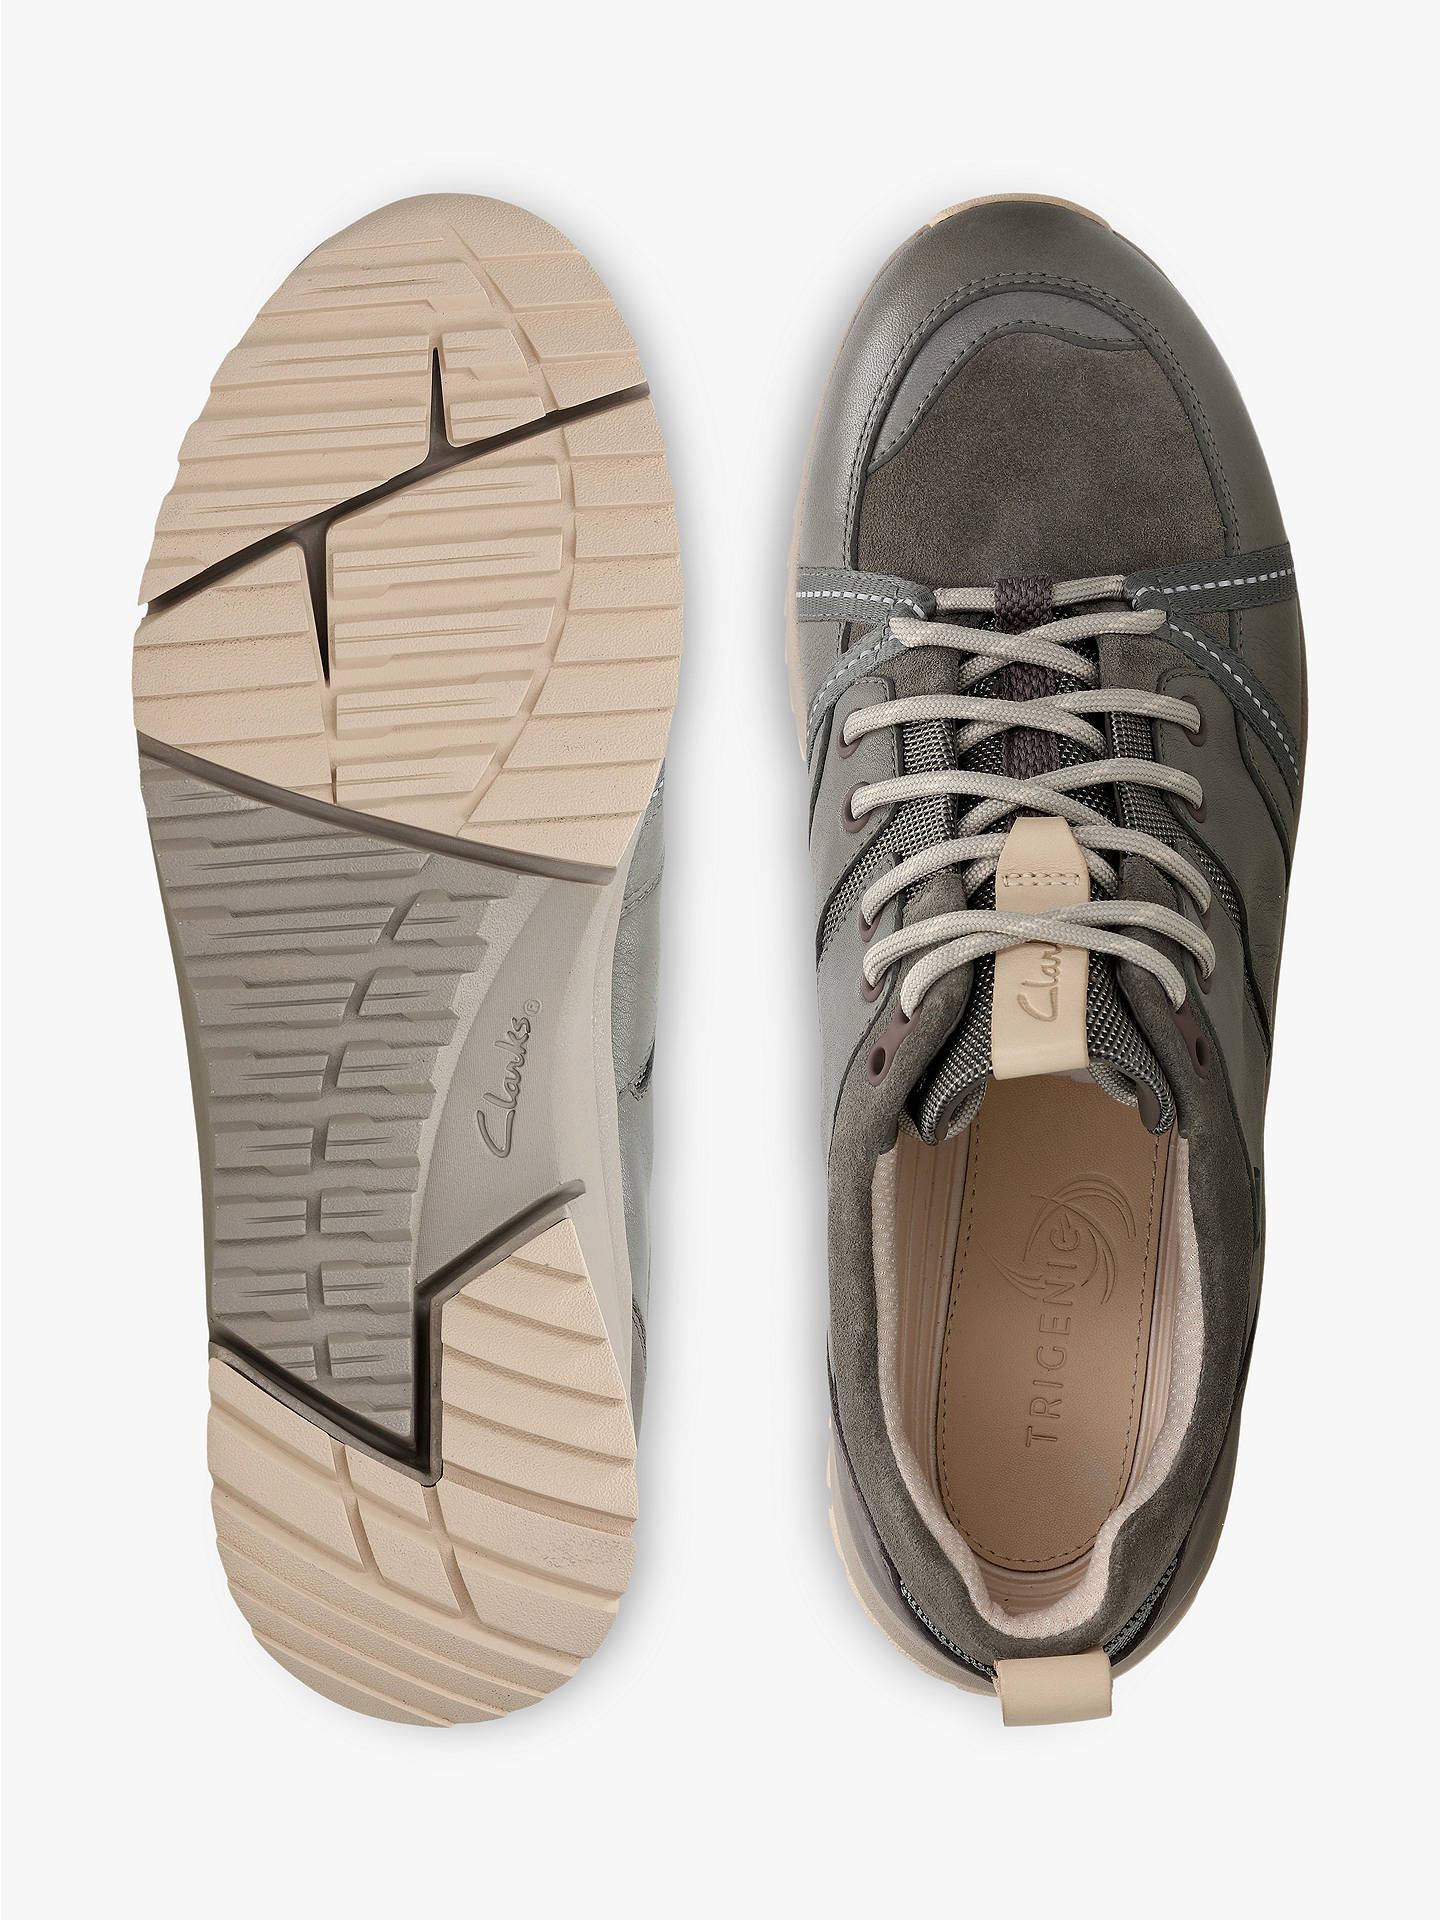 4bd2e3a4 ... Buy Clarks Tri Trek GORE-TEX Trainers, Khaki Leather, 3 Online at  johnlewis